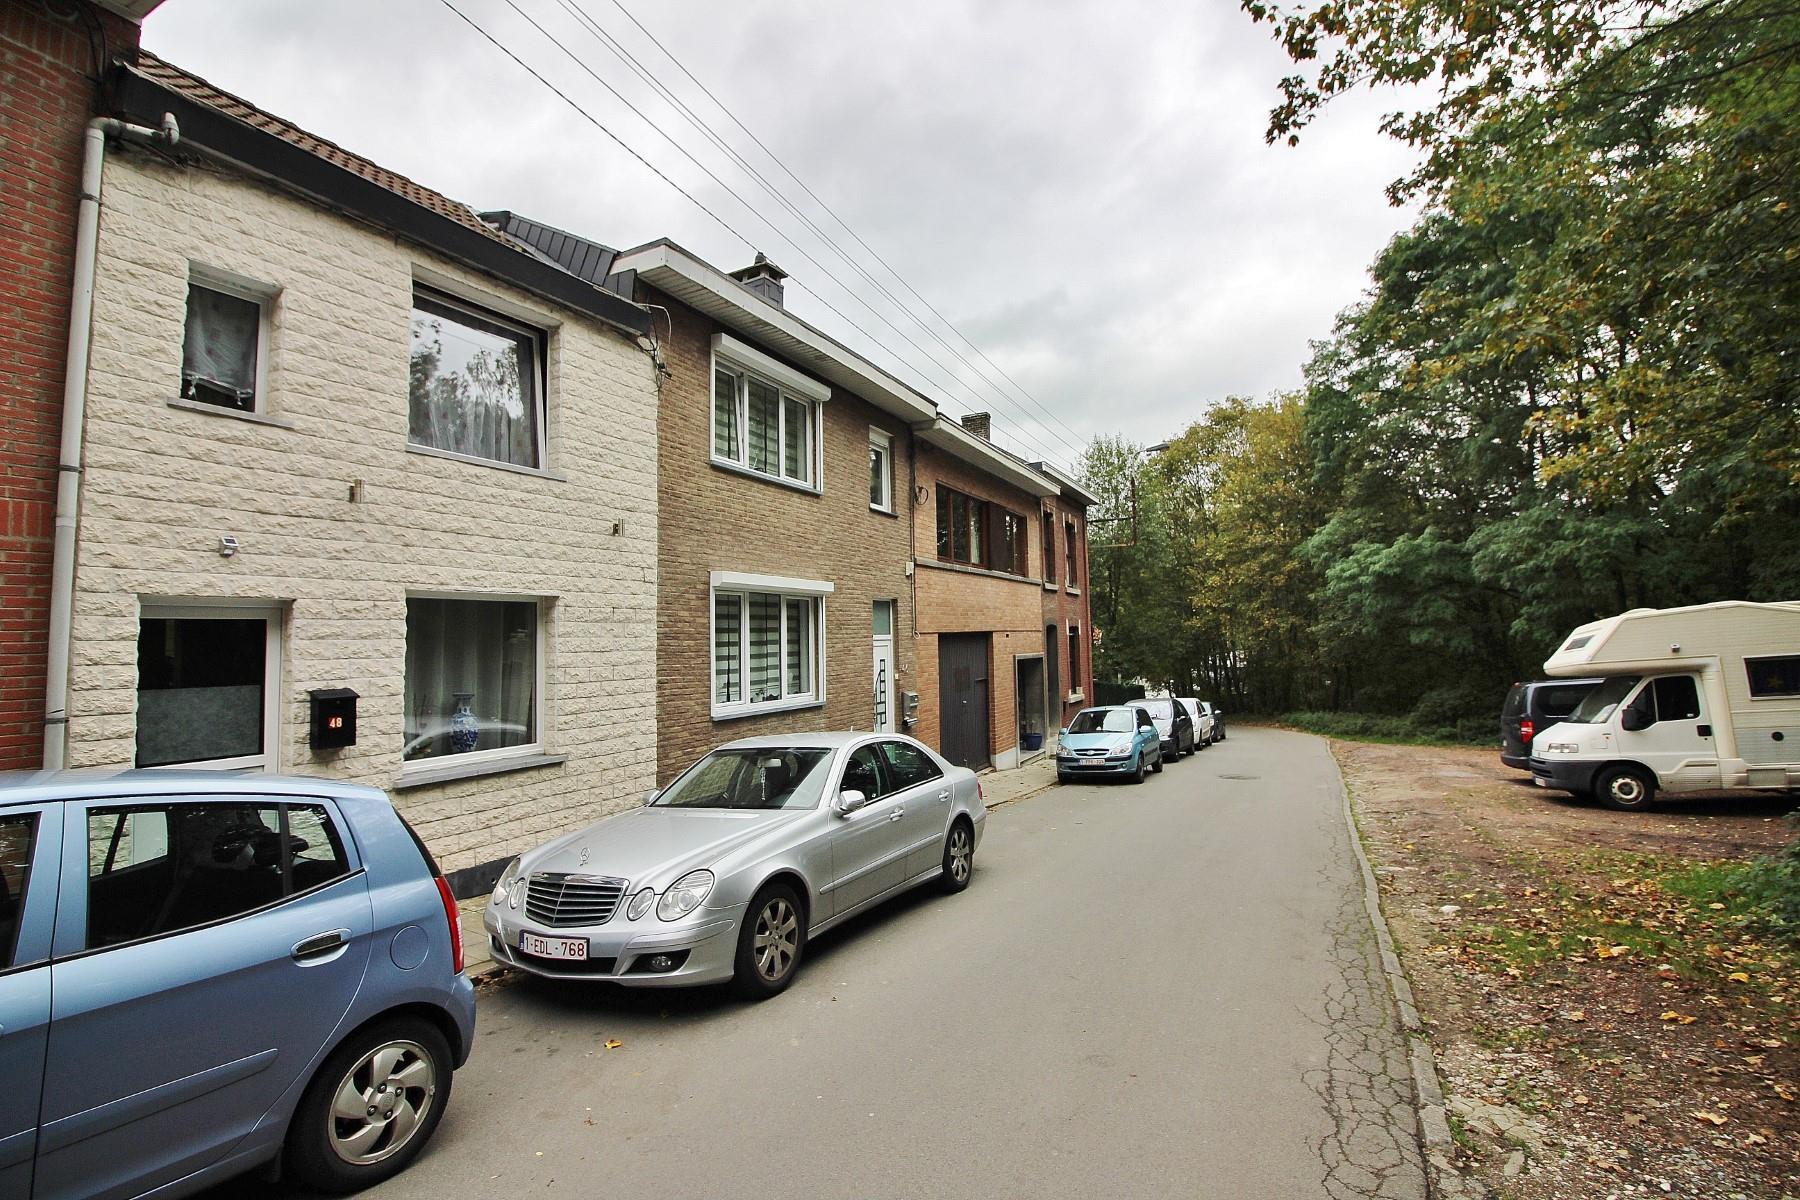 Maison - Seraing Jemeppesur-Meuse - #3879549-1